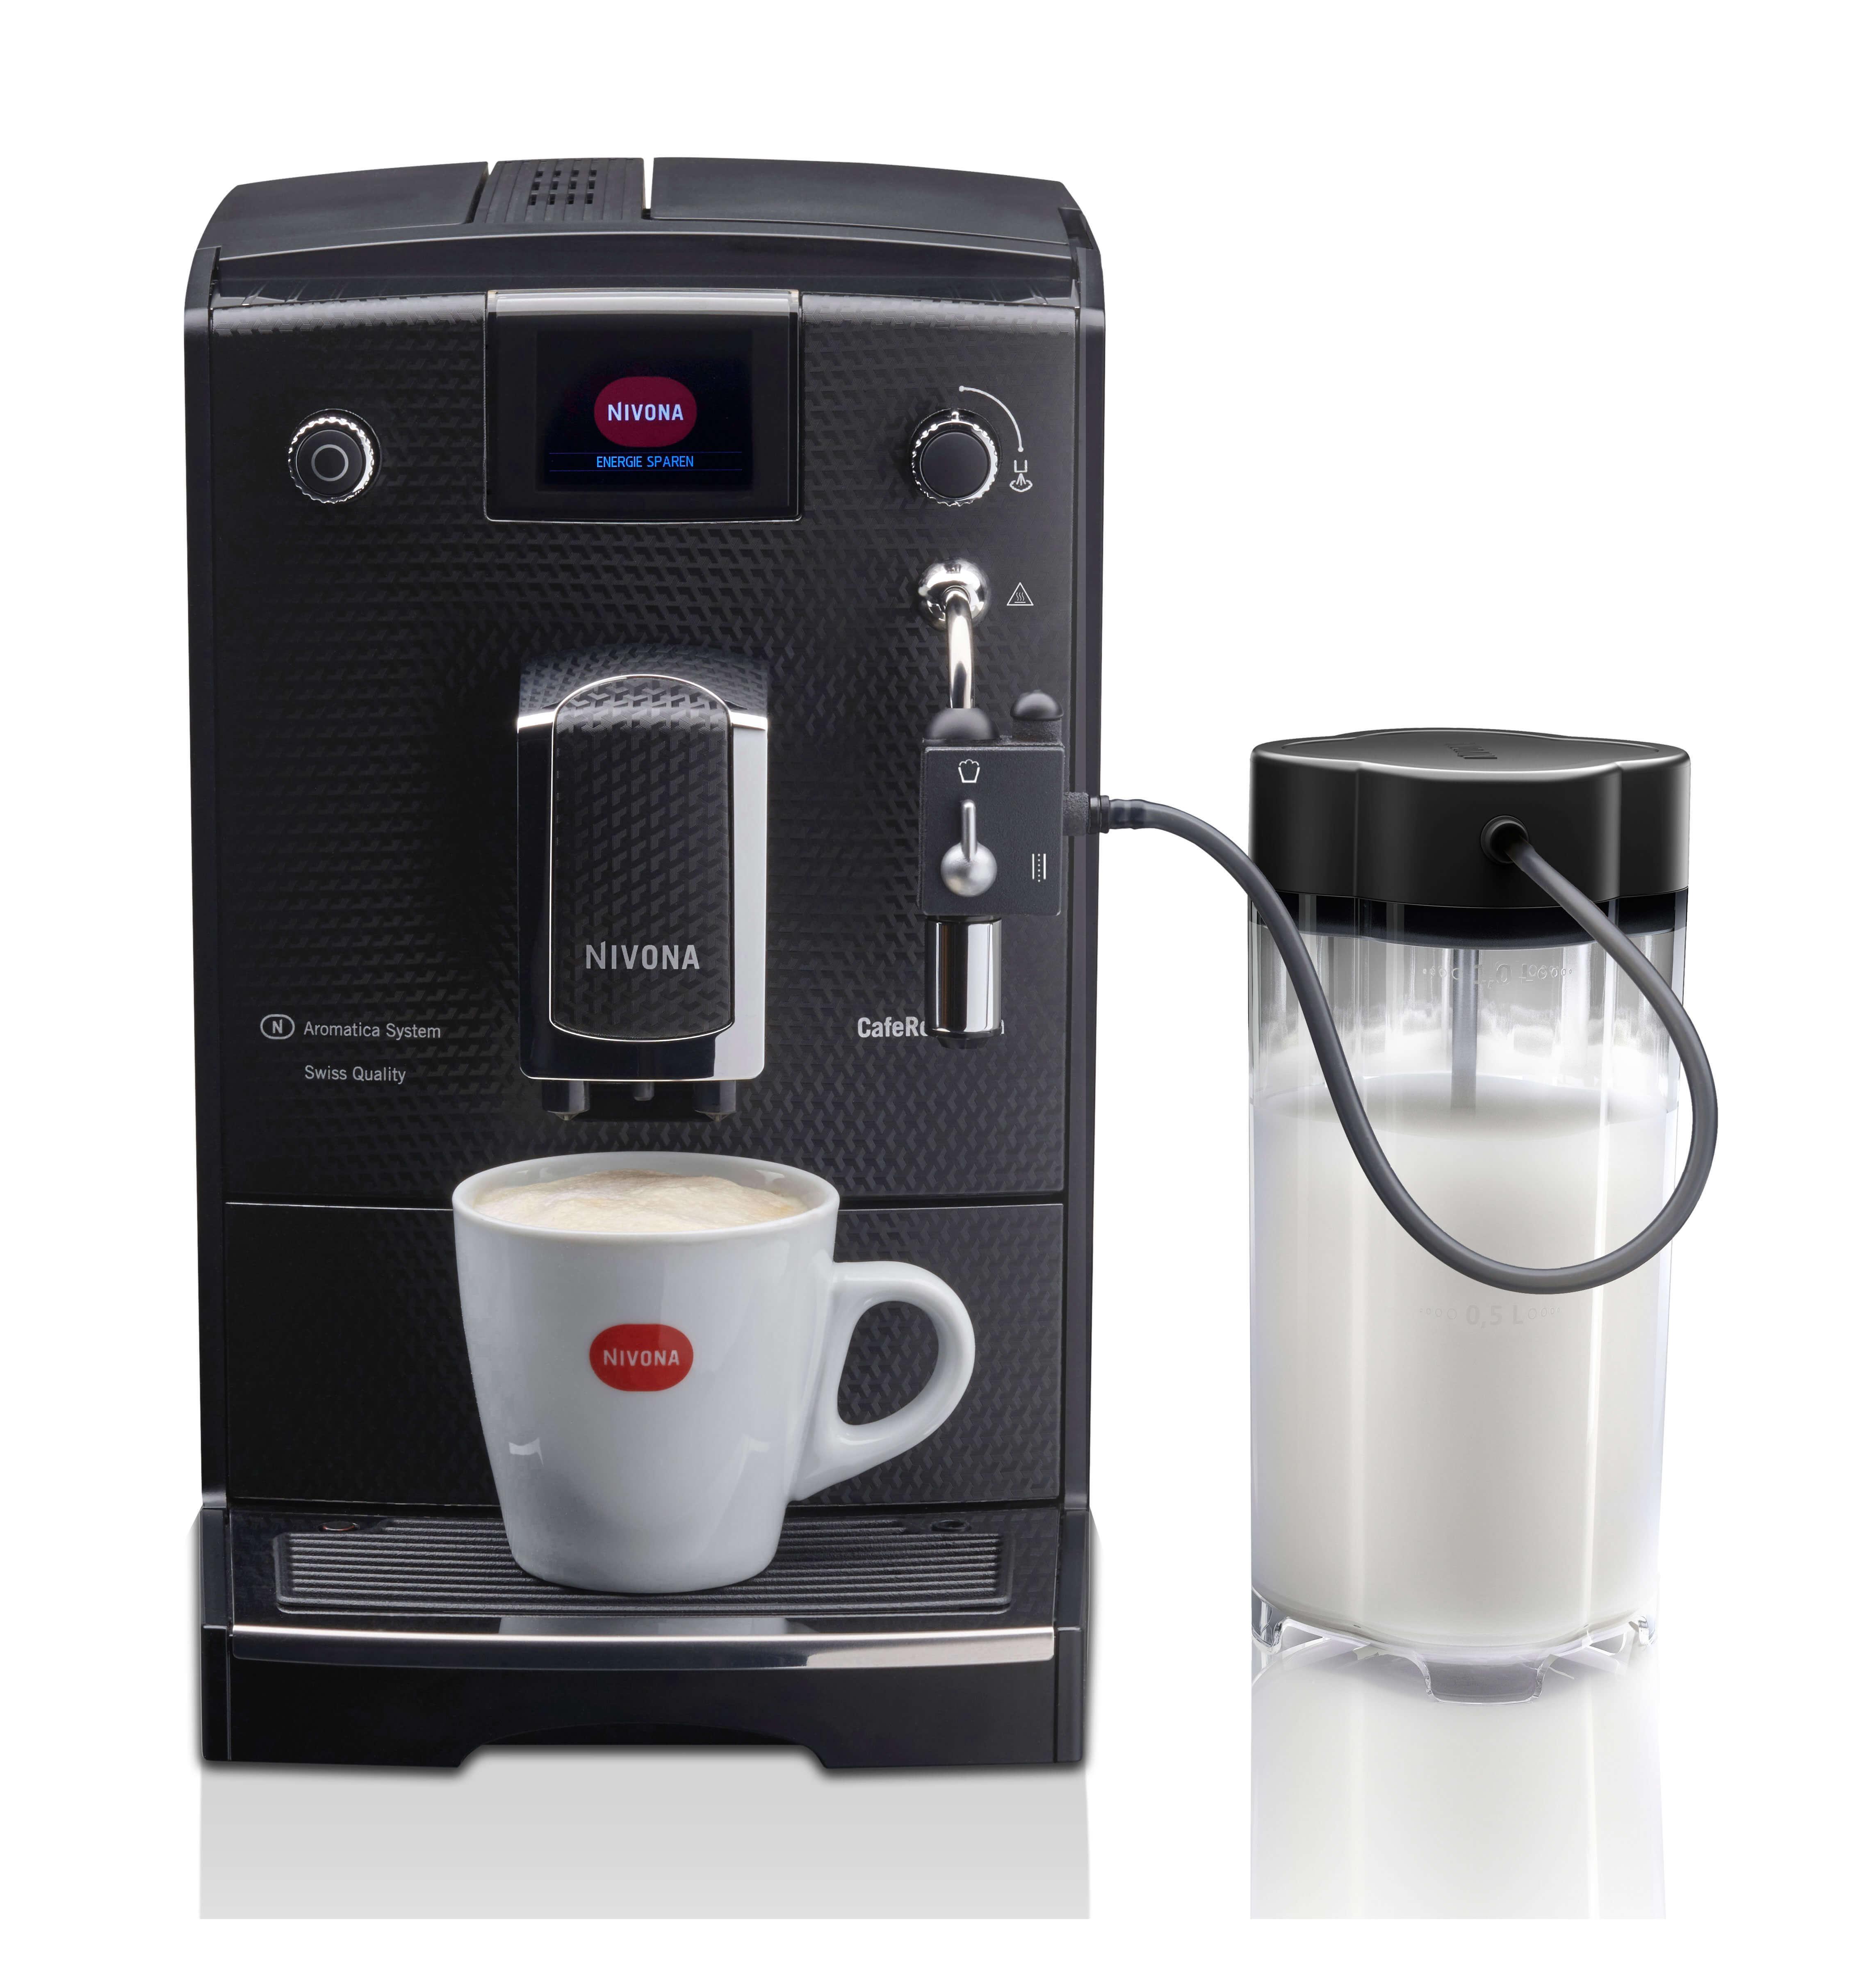 Nivona Kaffeevollautomat Cafe Romantica NICR 680 | Kamasega